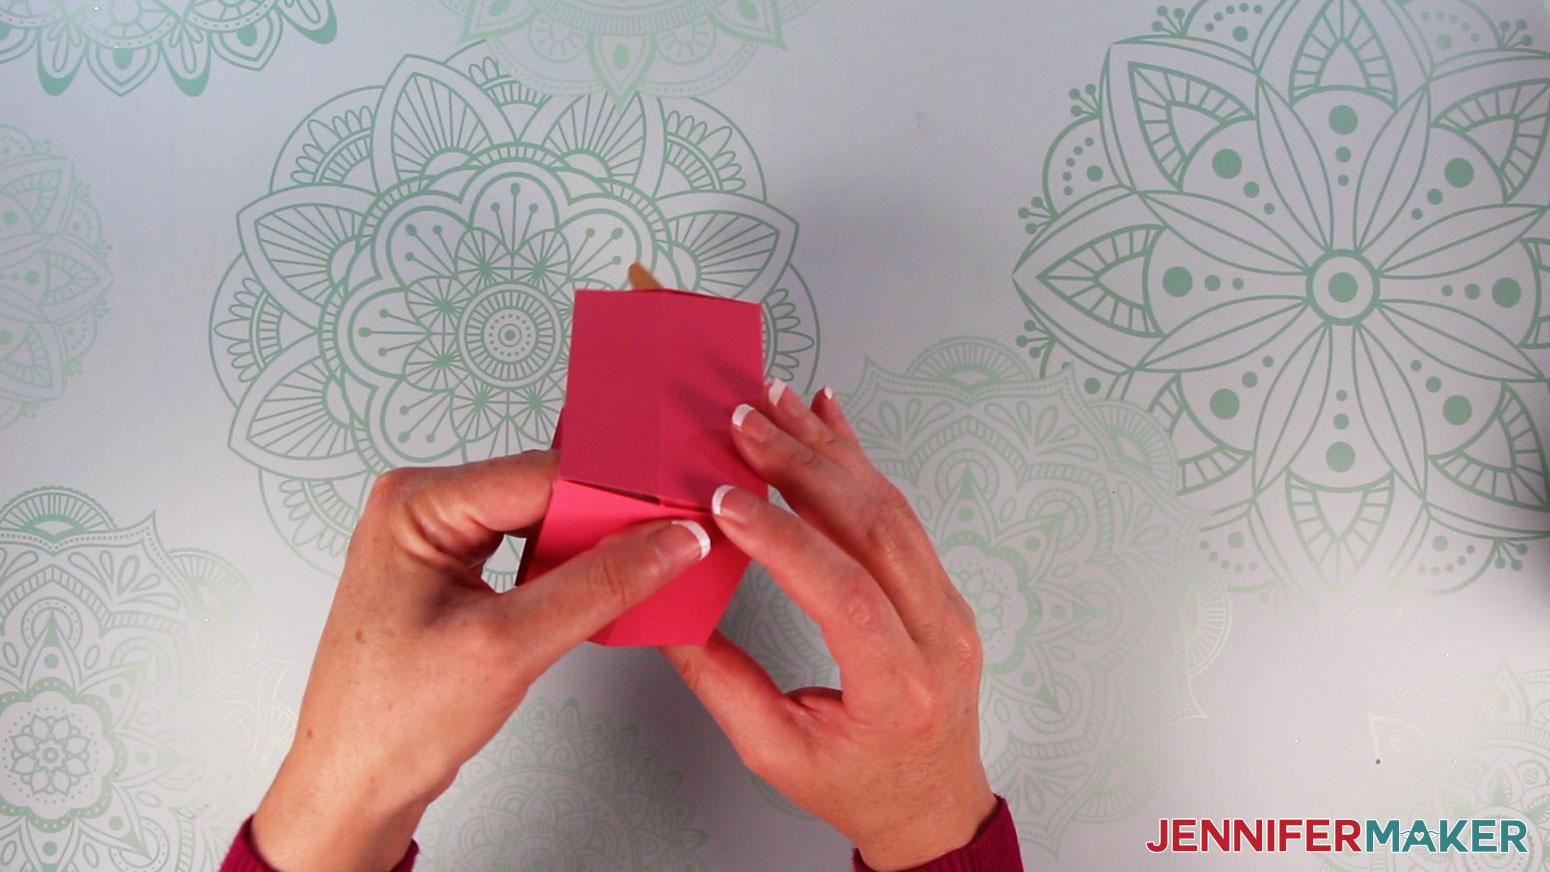 Apply pressure to popsicle box until glue adheres